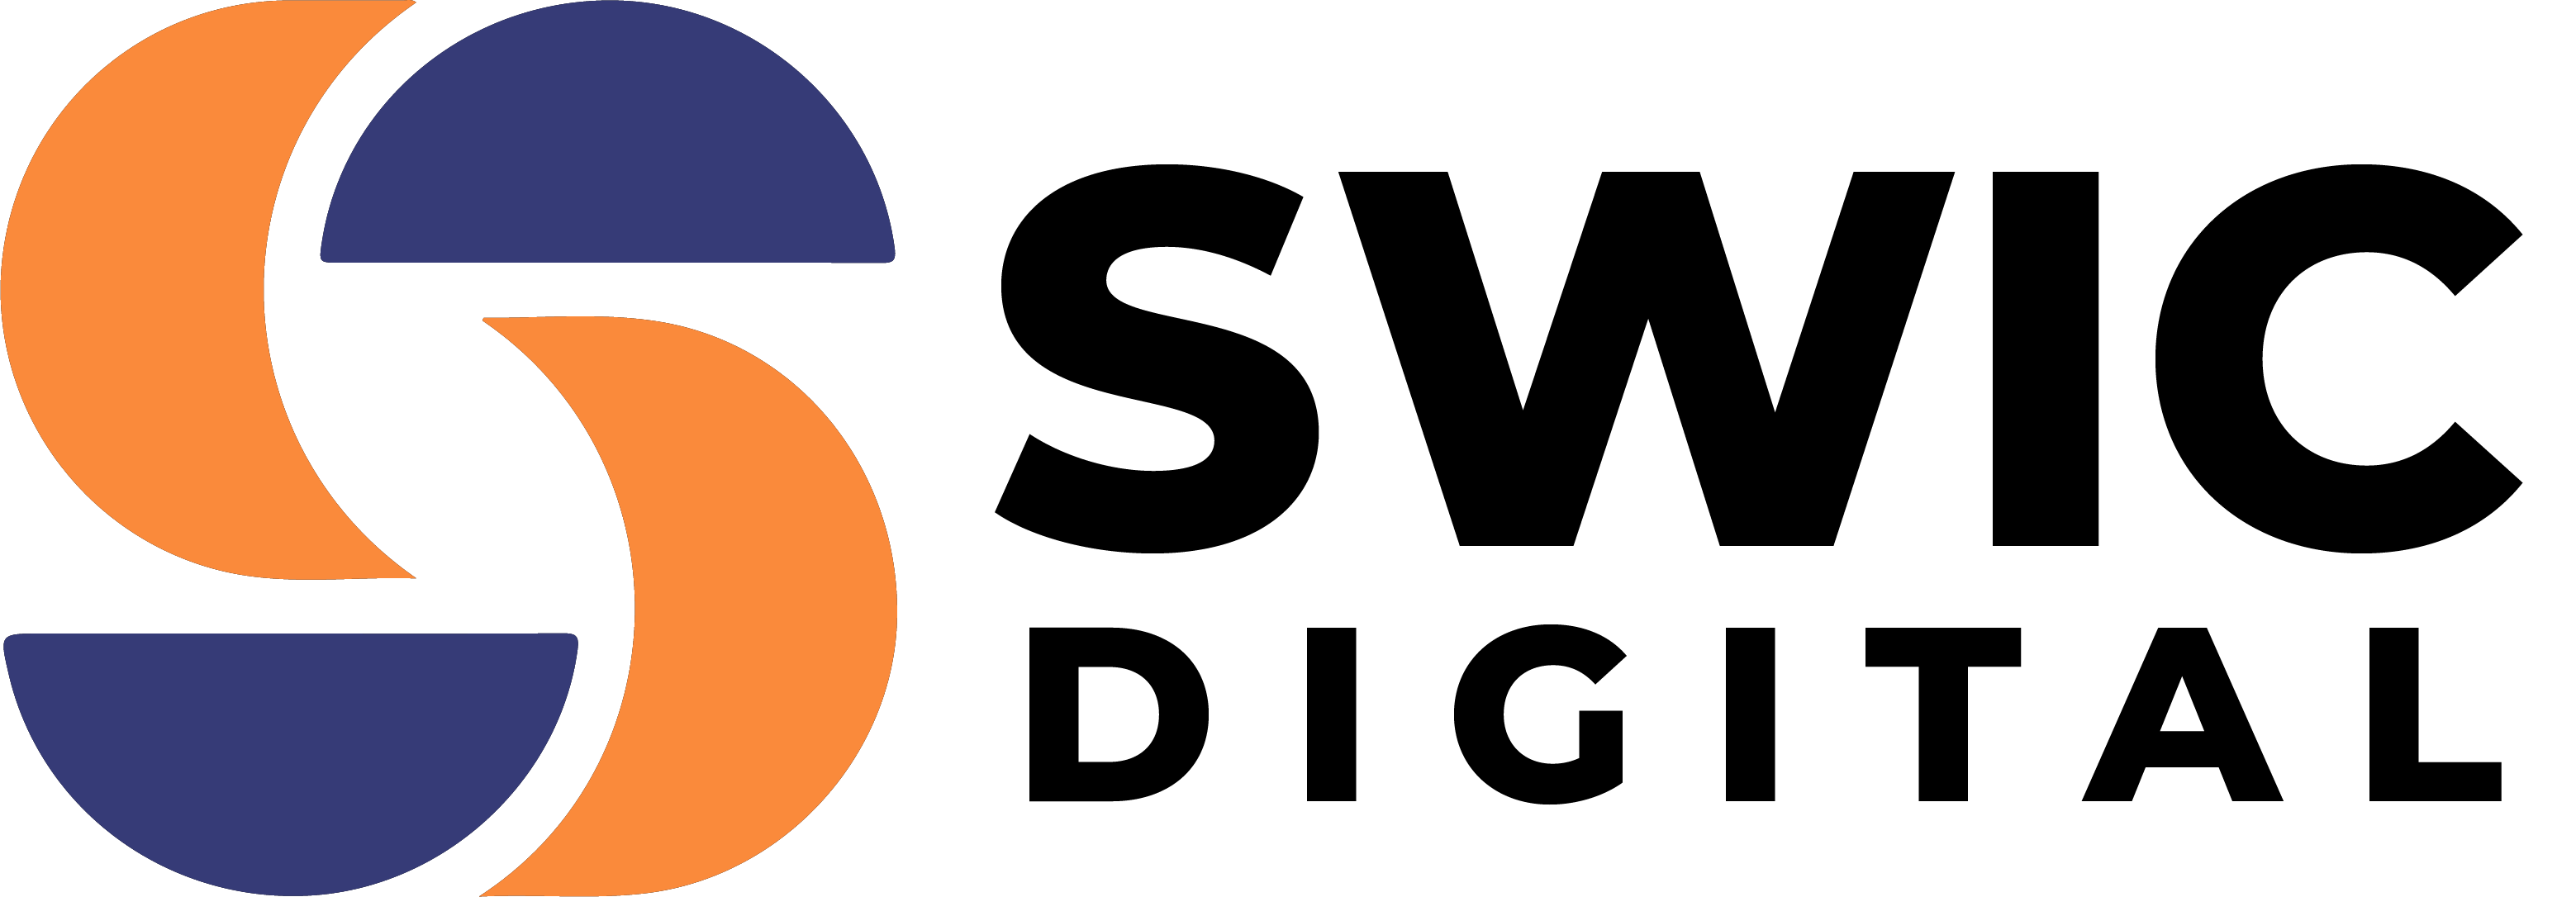 Swicdigital Logo